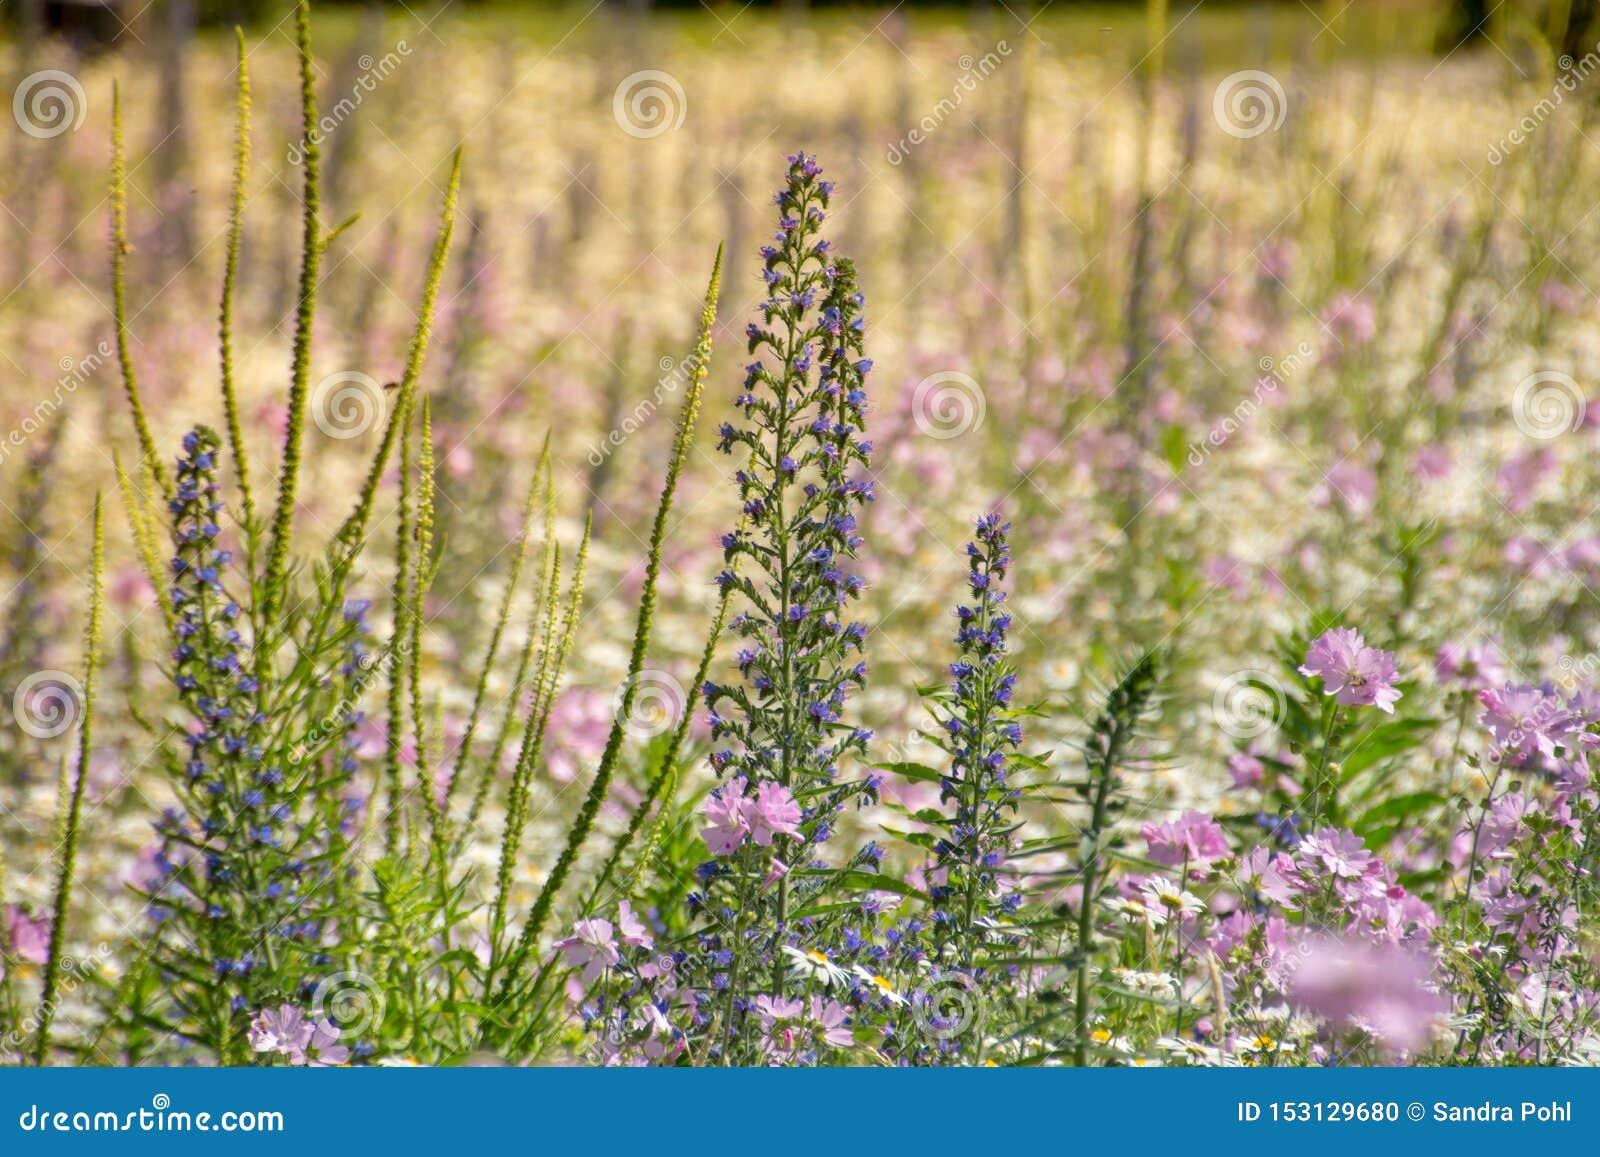 Natural violet flowers meadow violet